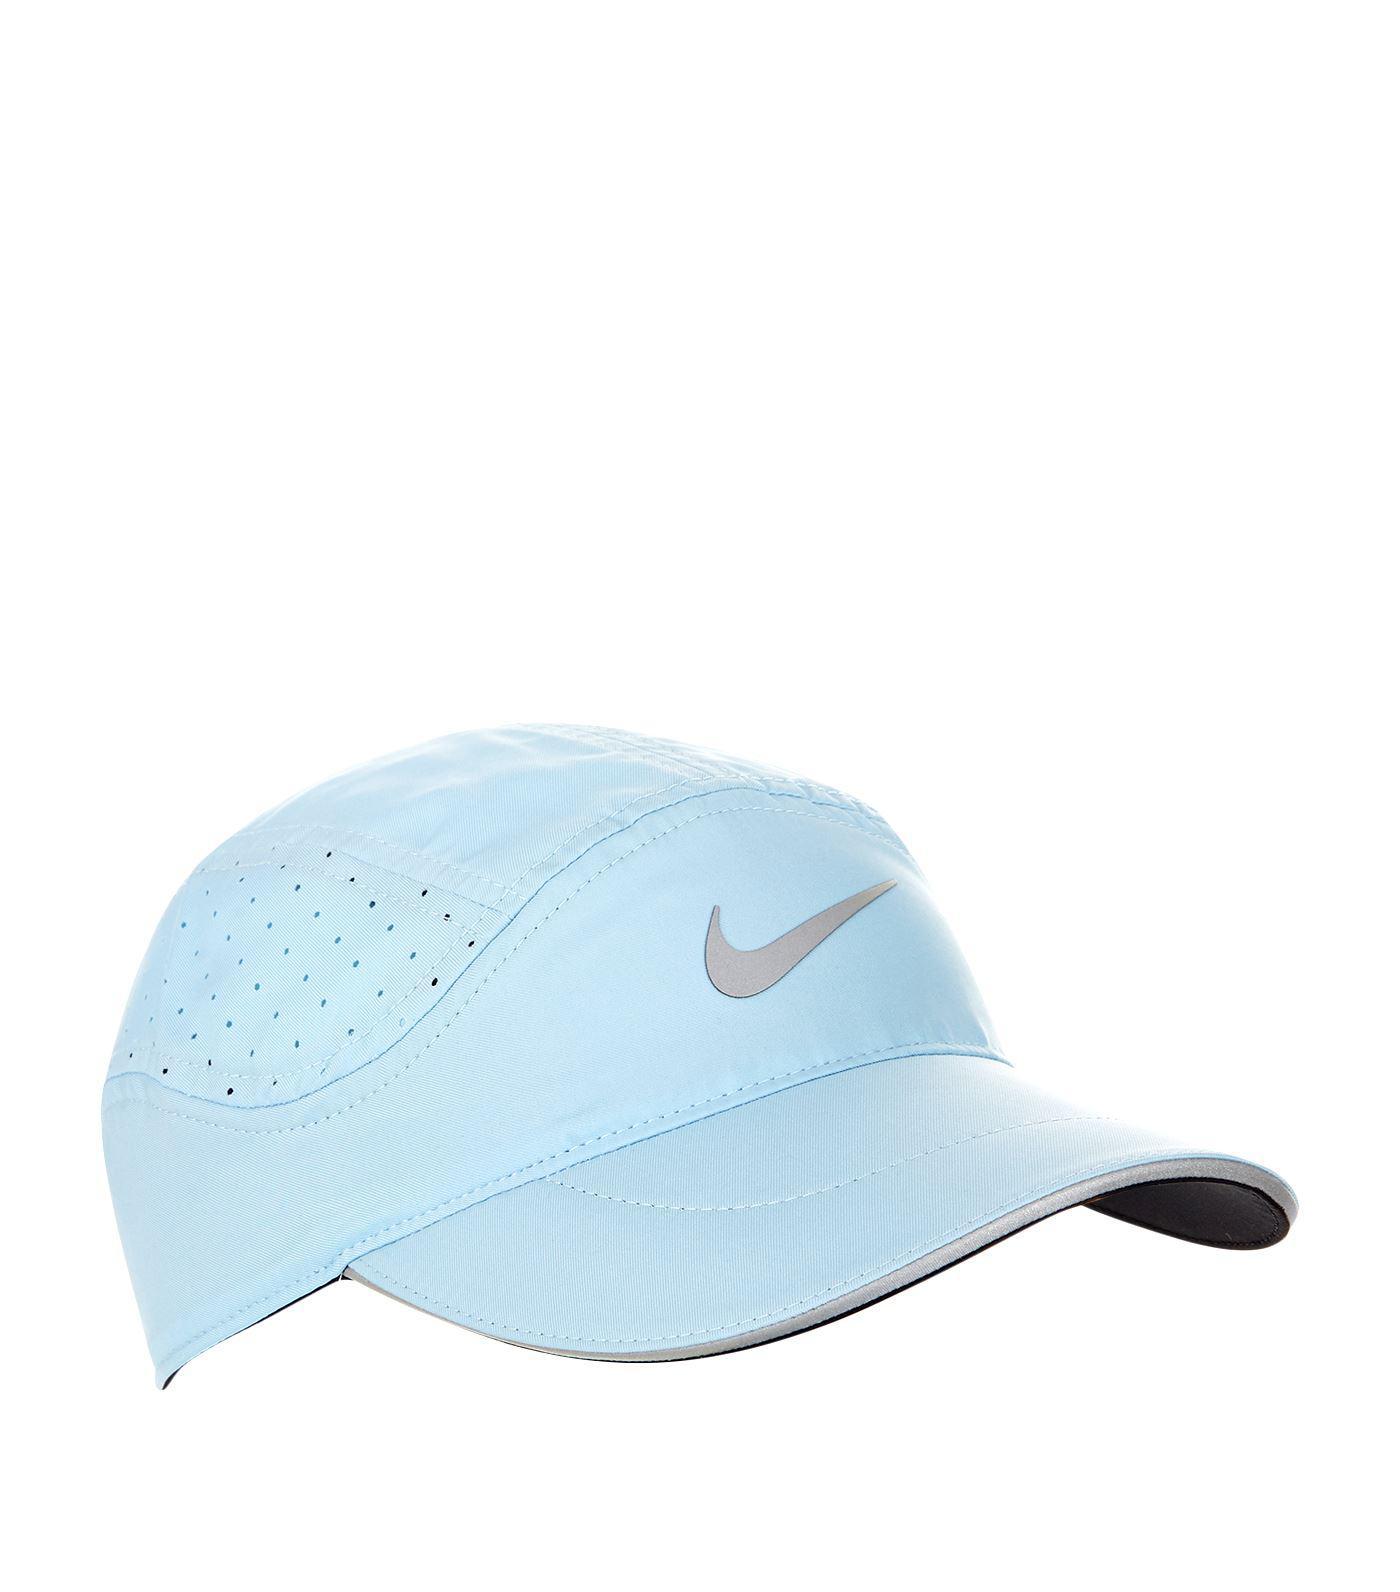 38f05aa8ea4ff Lyst - Nike Aerobill Running Cap